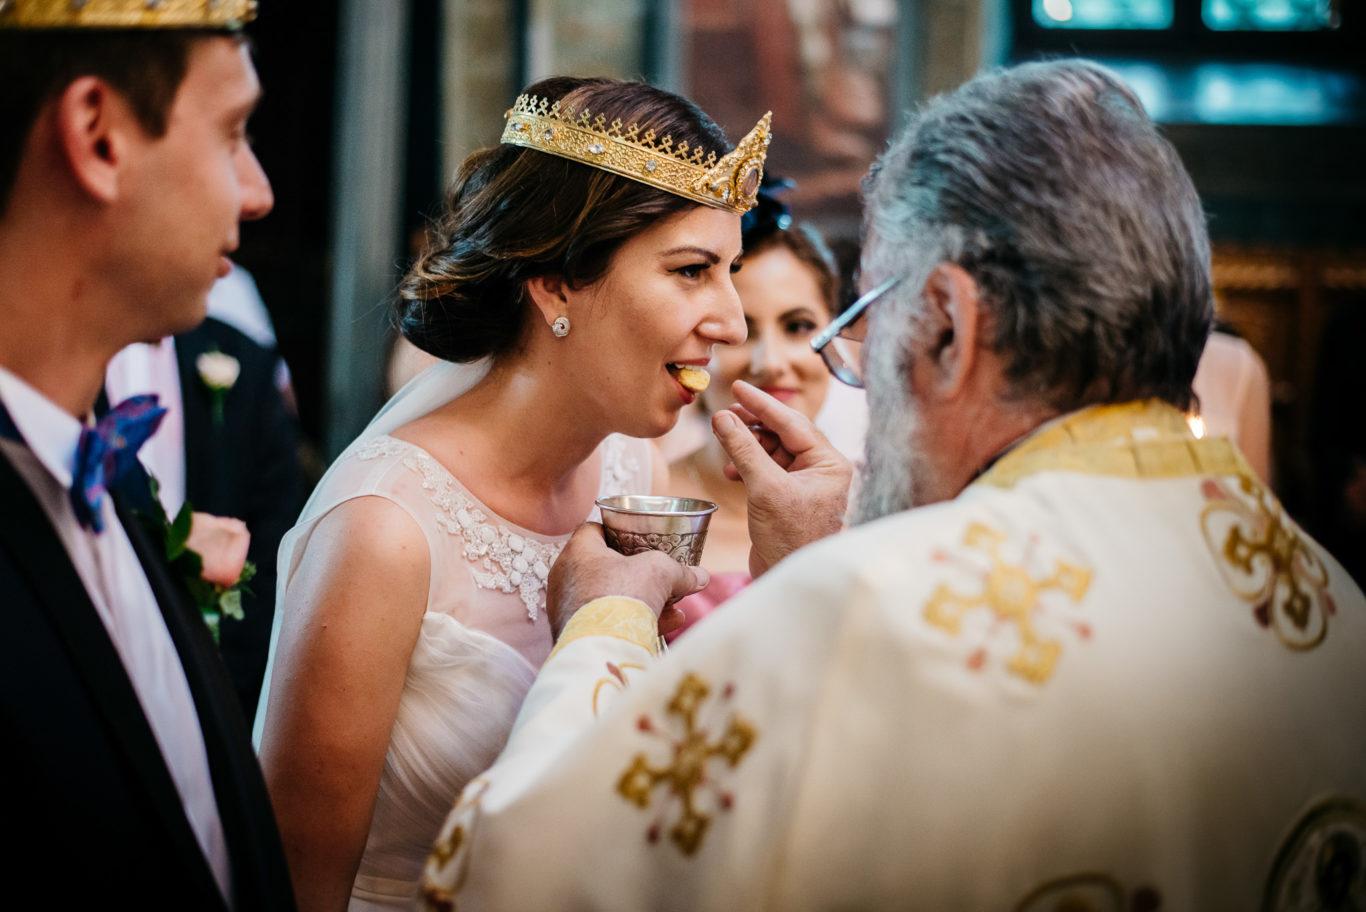 0402-Fotografie-nunta-Bucuresti-Oana-Catalin-fotograf-Ciprian-Dumitrescu-DSC_4255